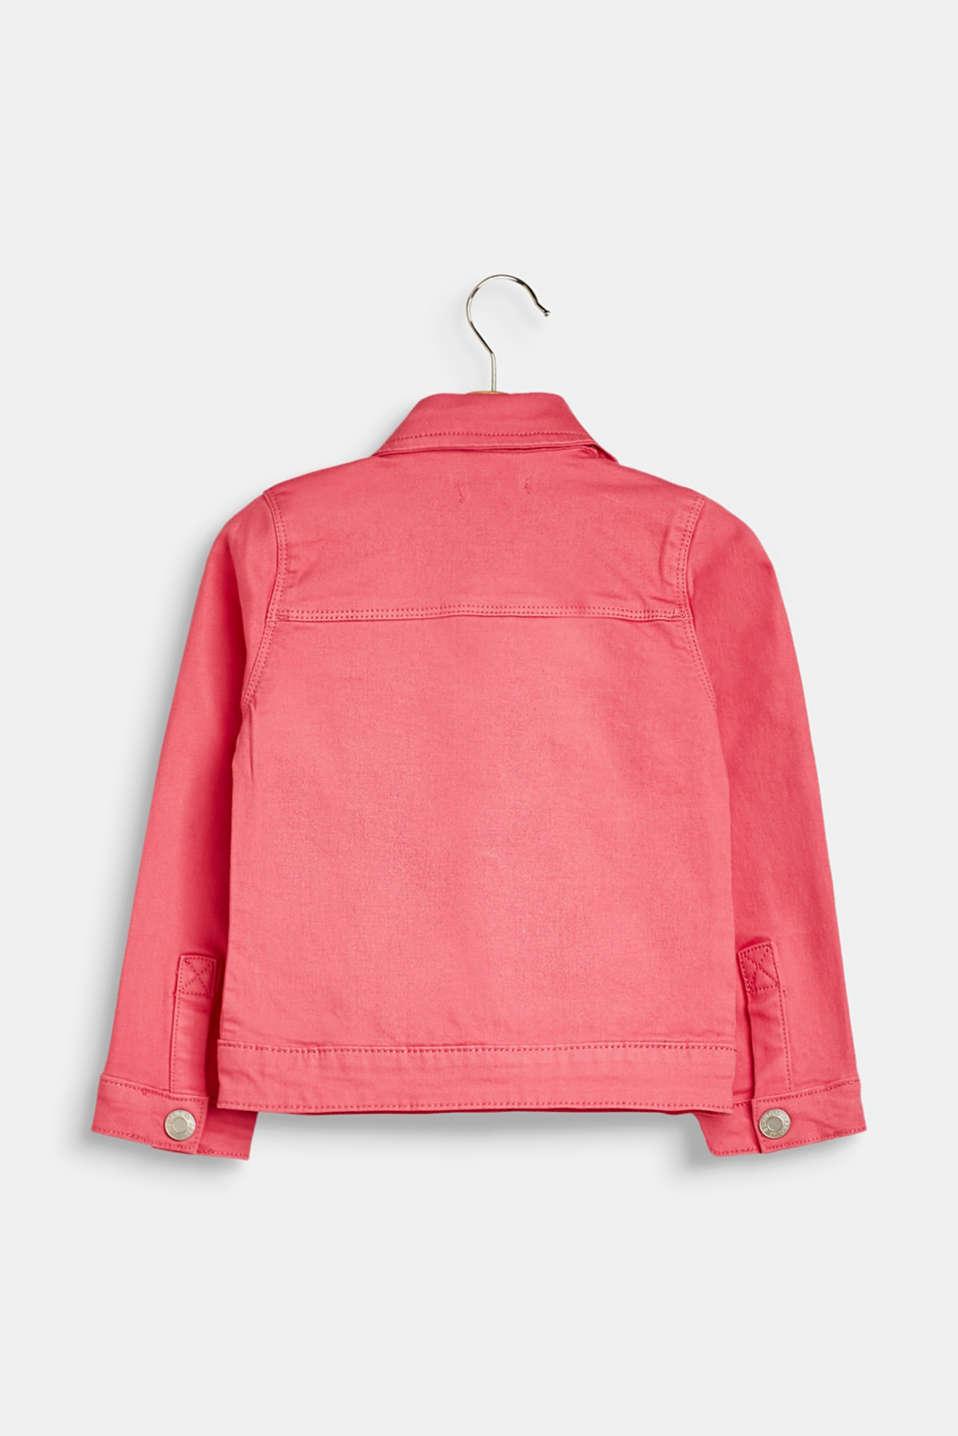 Jackets outdoor denim, LCDARK PINK, detail image number 1